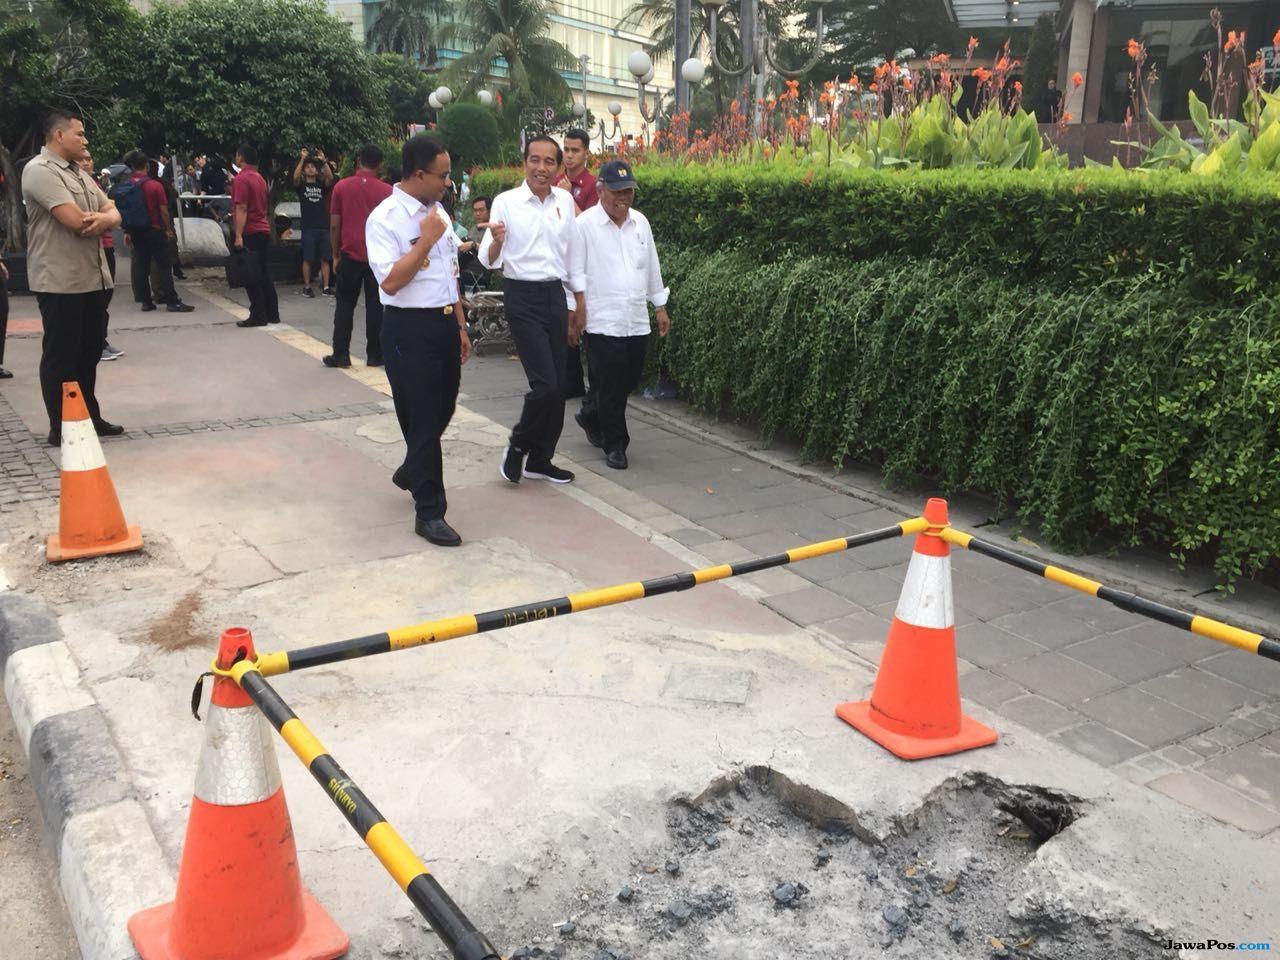 Ajak Jokowi dan Basuki, Anies Pamer Pelican Crossing Ramah Disabilitas